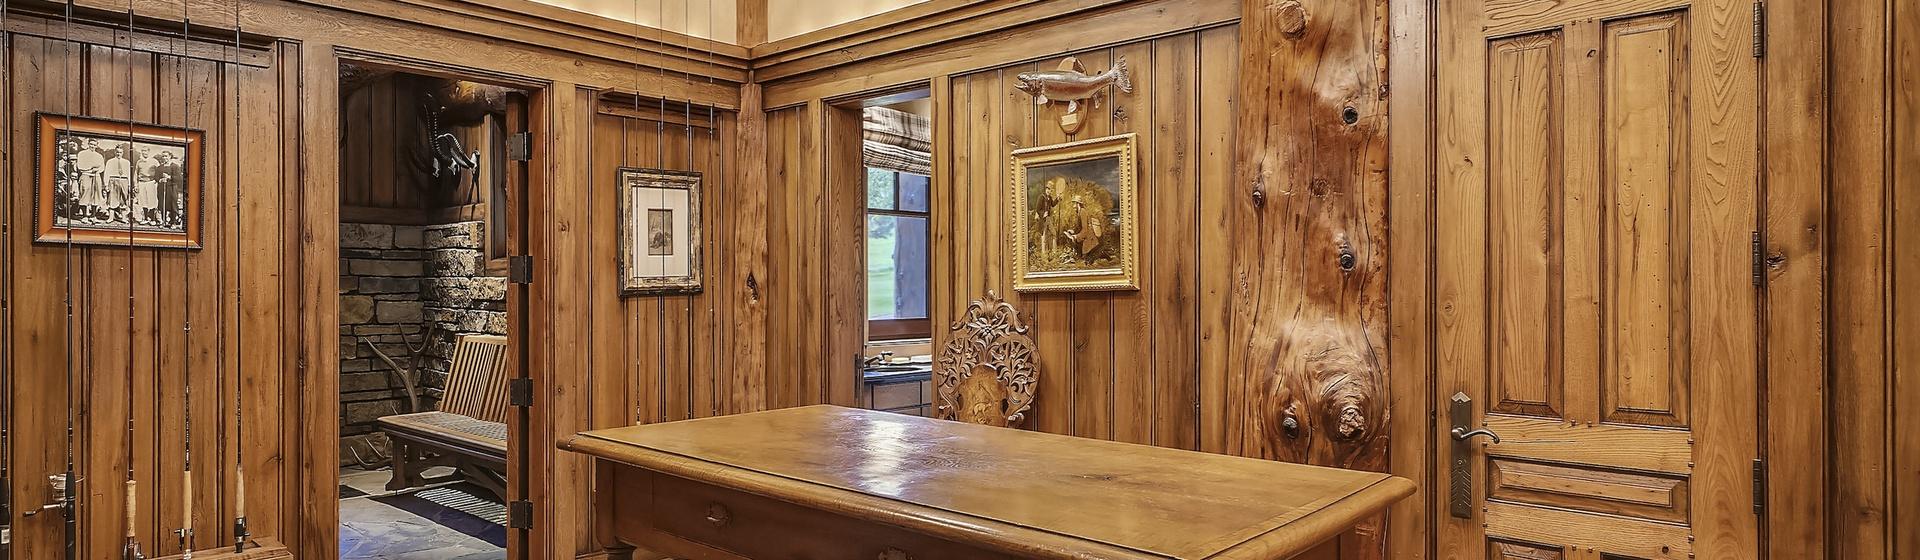 3.3-Telluride-Sleeping-Indian-Ranch-gun-room-1-web.JPG